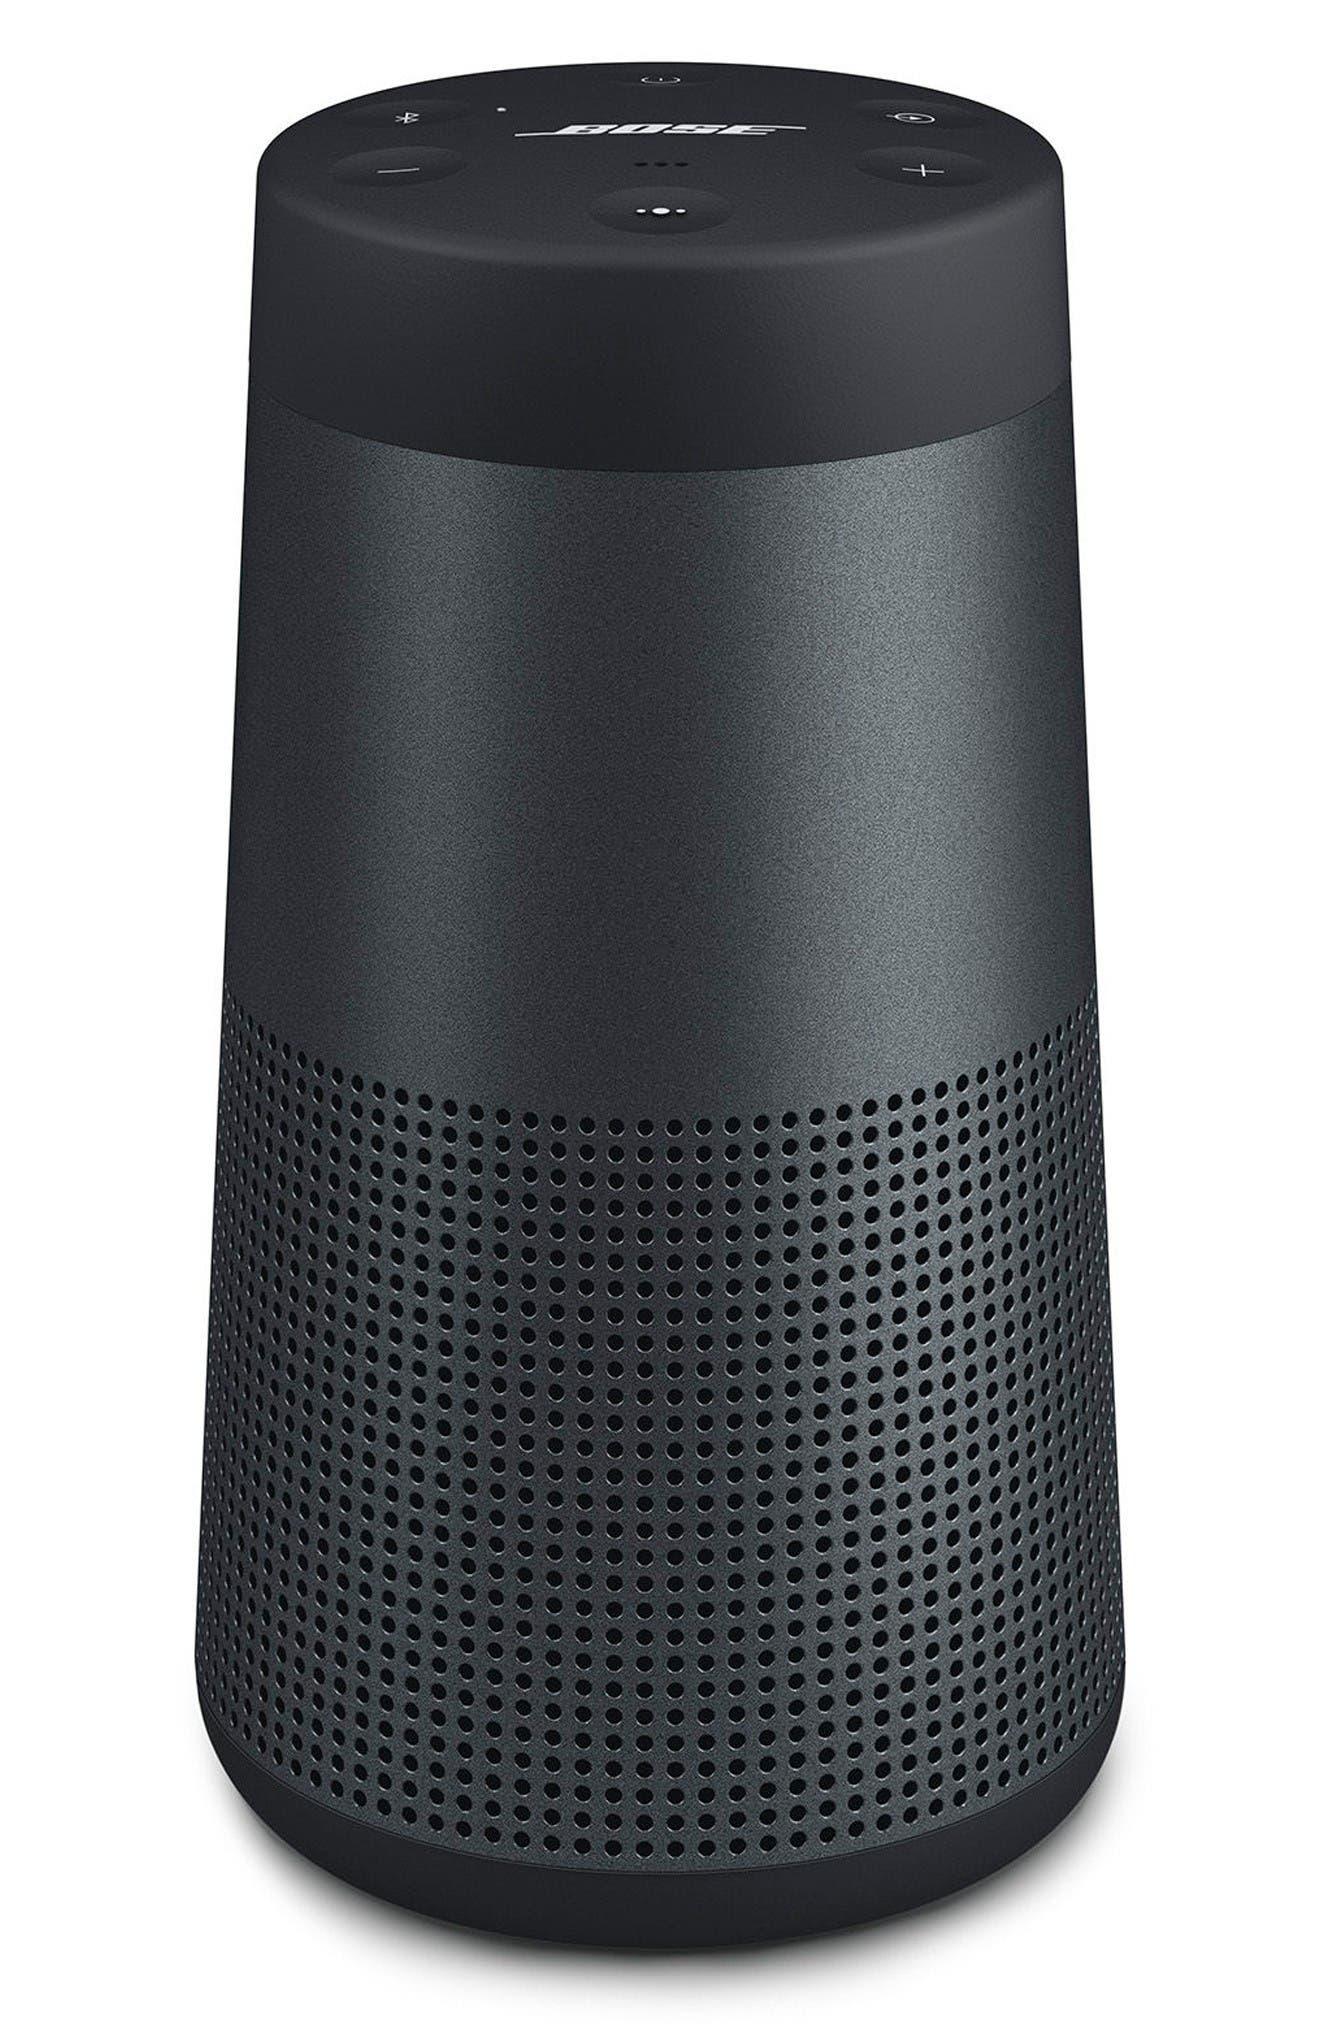 BOSE<SUP>®</SUP> SoundLink<sup>®</sup> Revolve Bluetooth<sup>®</sup> Speaker